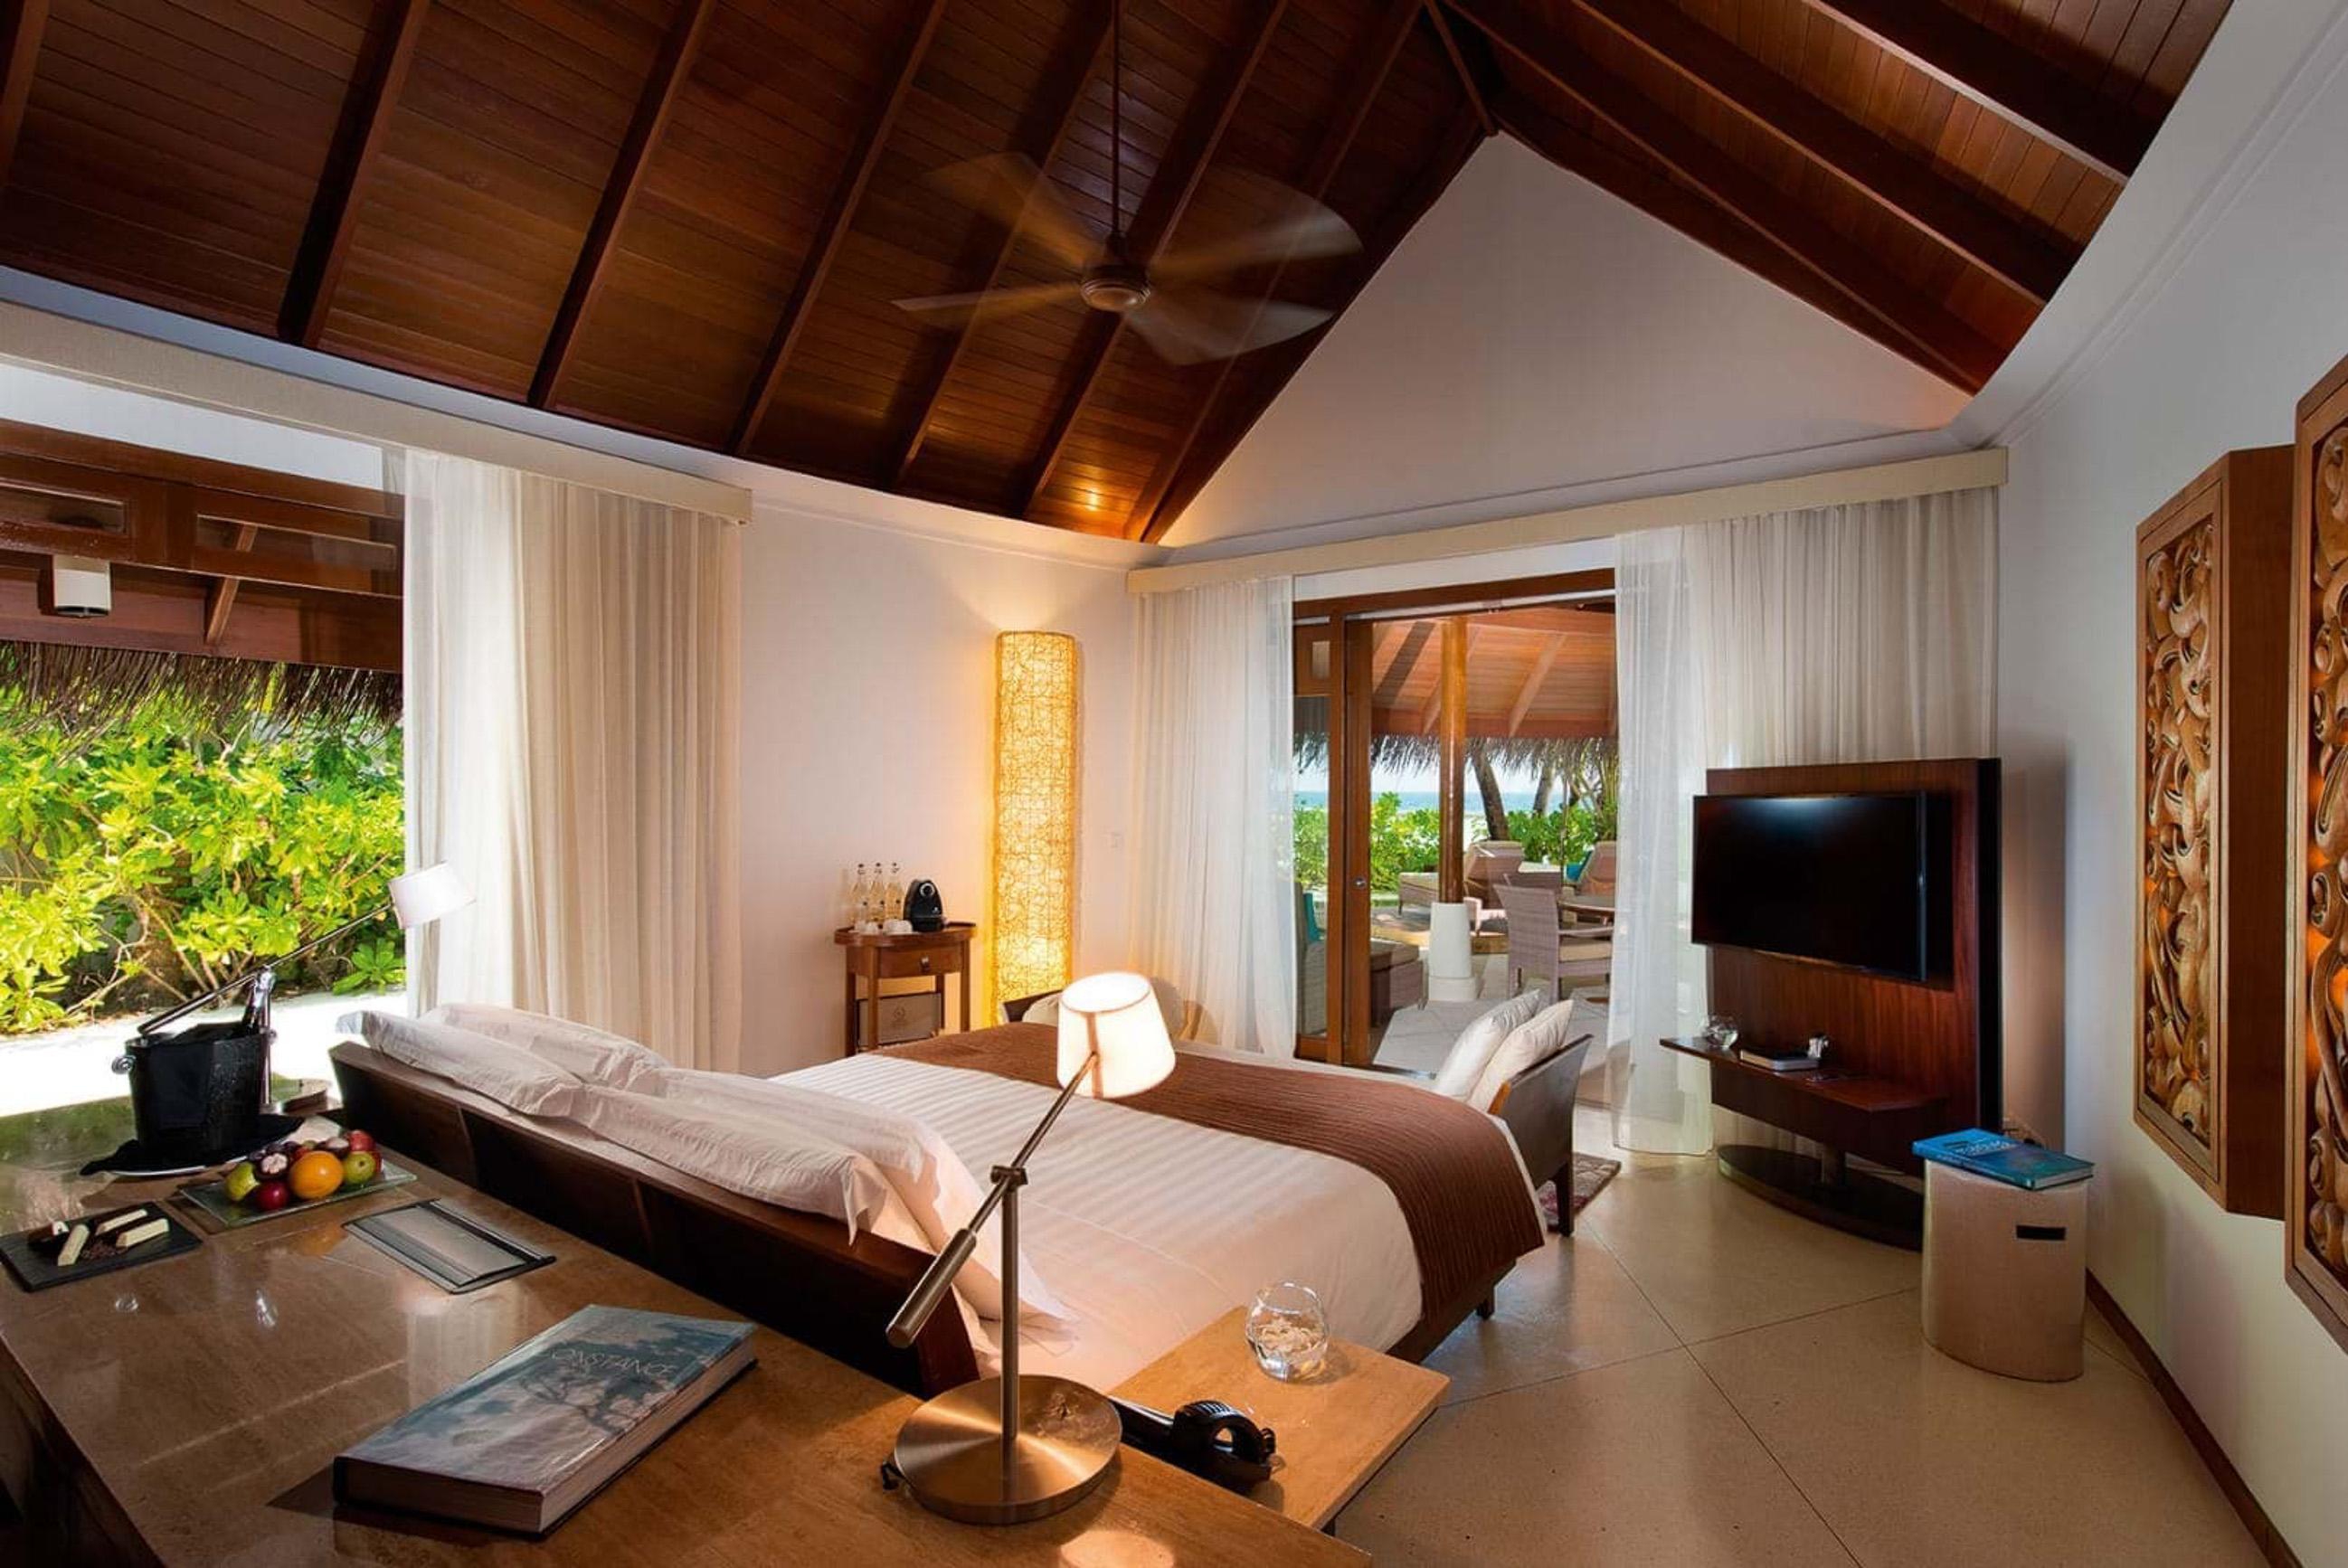 https://bubo.sk/uploads/galleries/16372/halaveli-maldives-2016-family-villa-bedroom-01-2.jpg